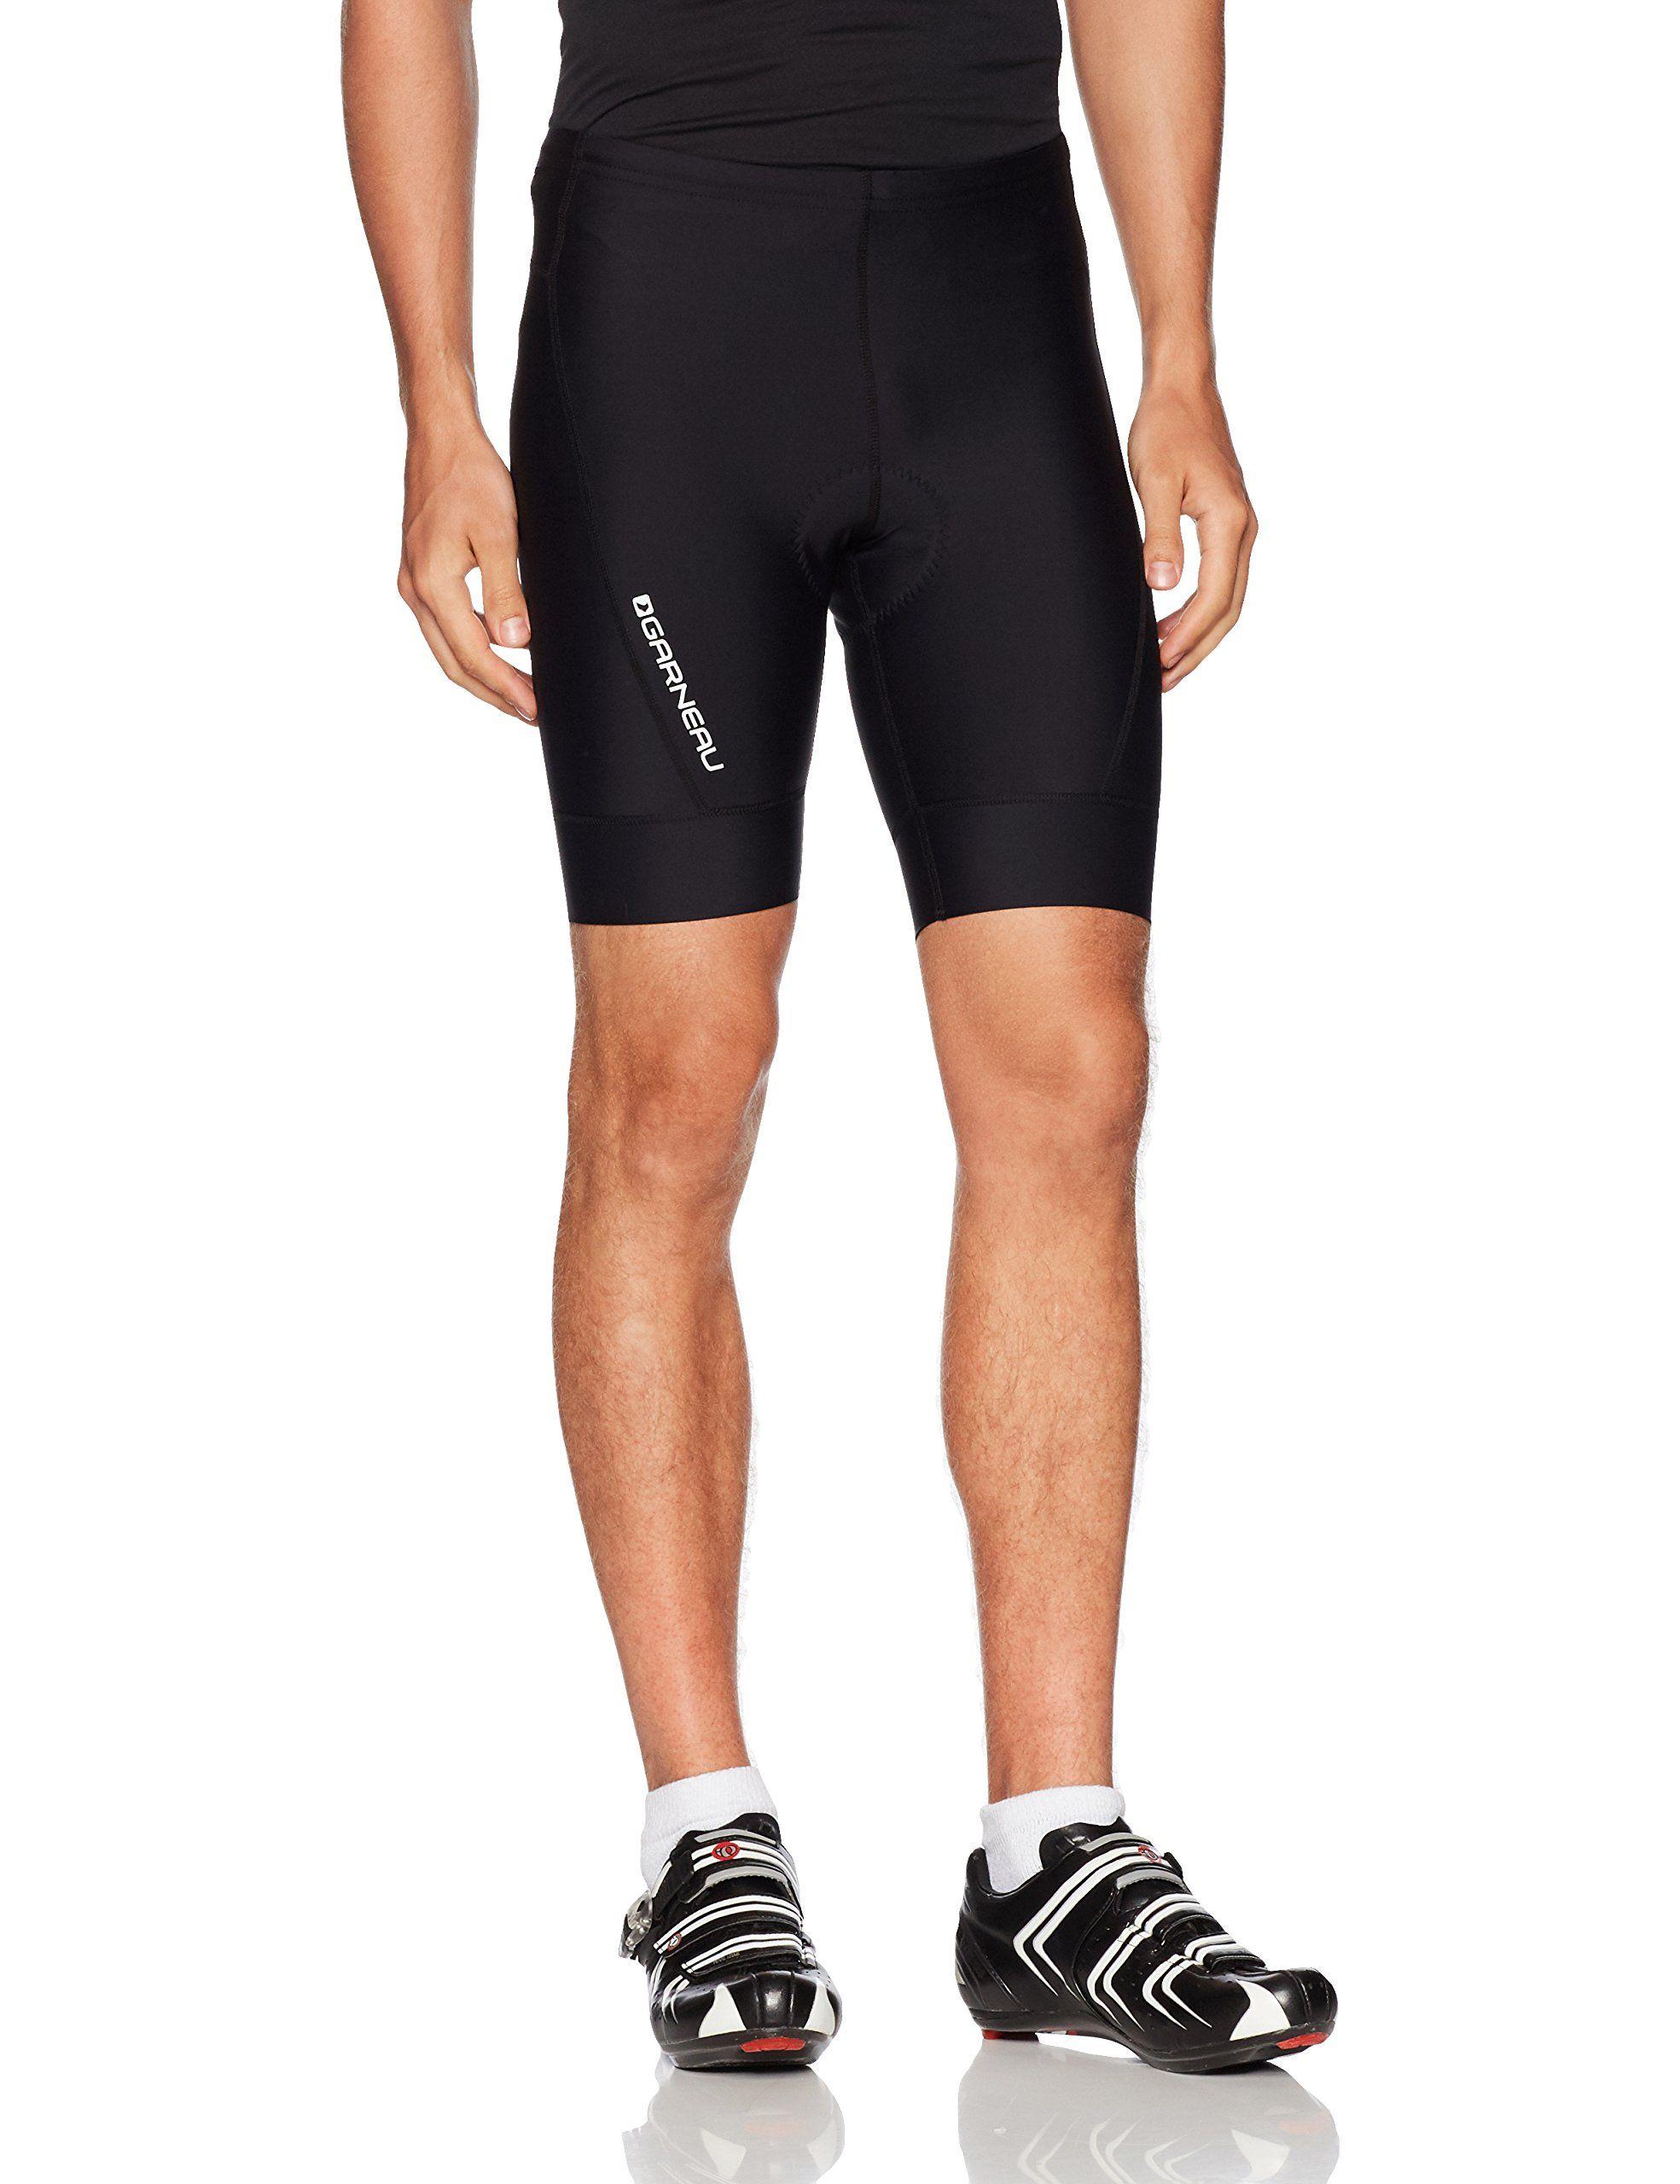 Louis Garneau Ride Gel Cycling Shorts Black Large Cycling